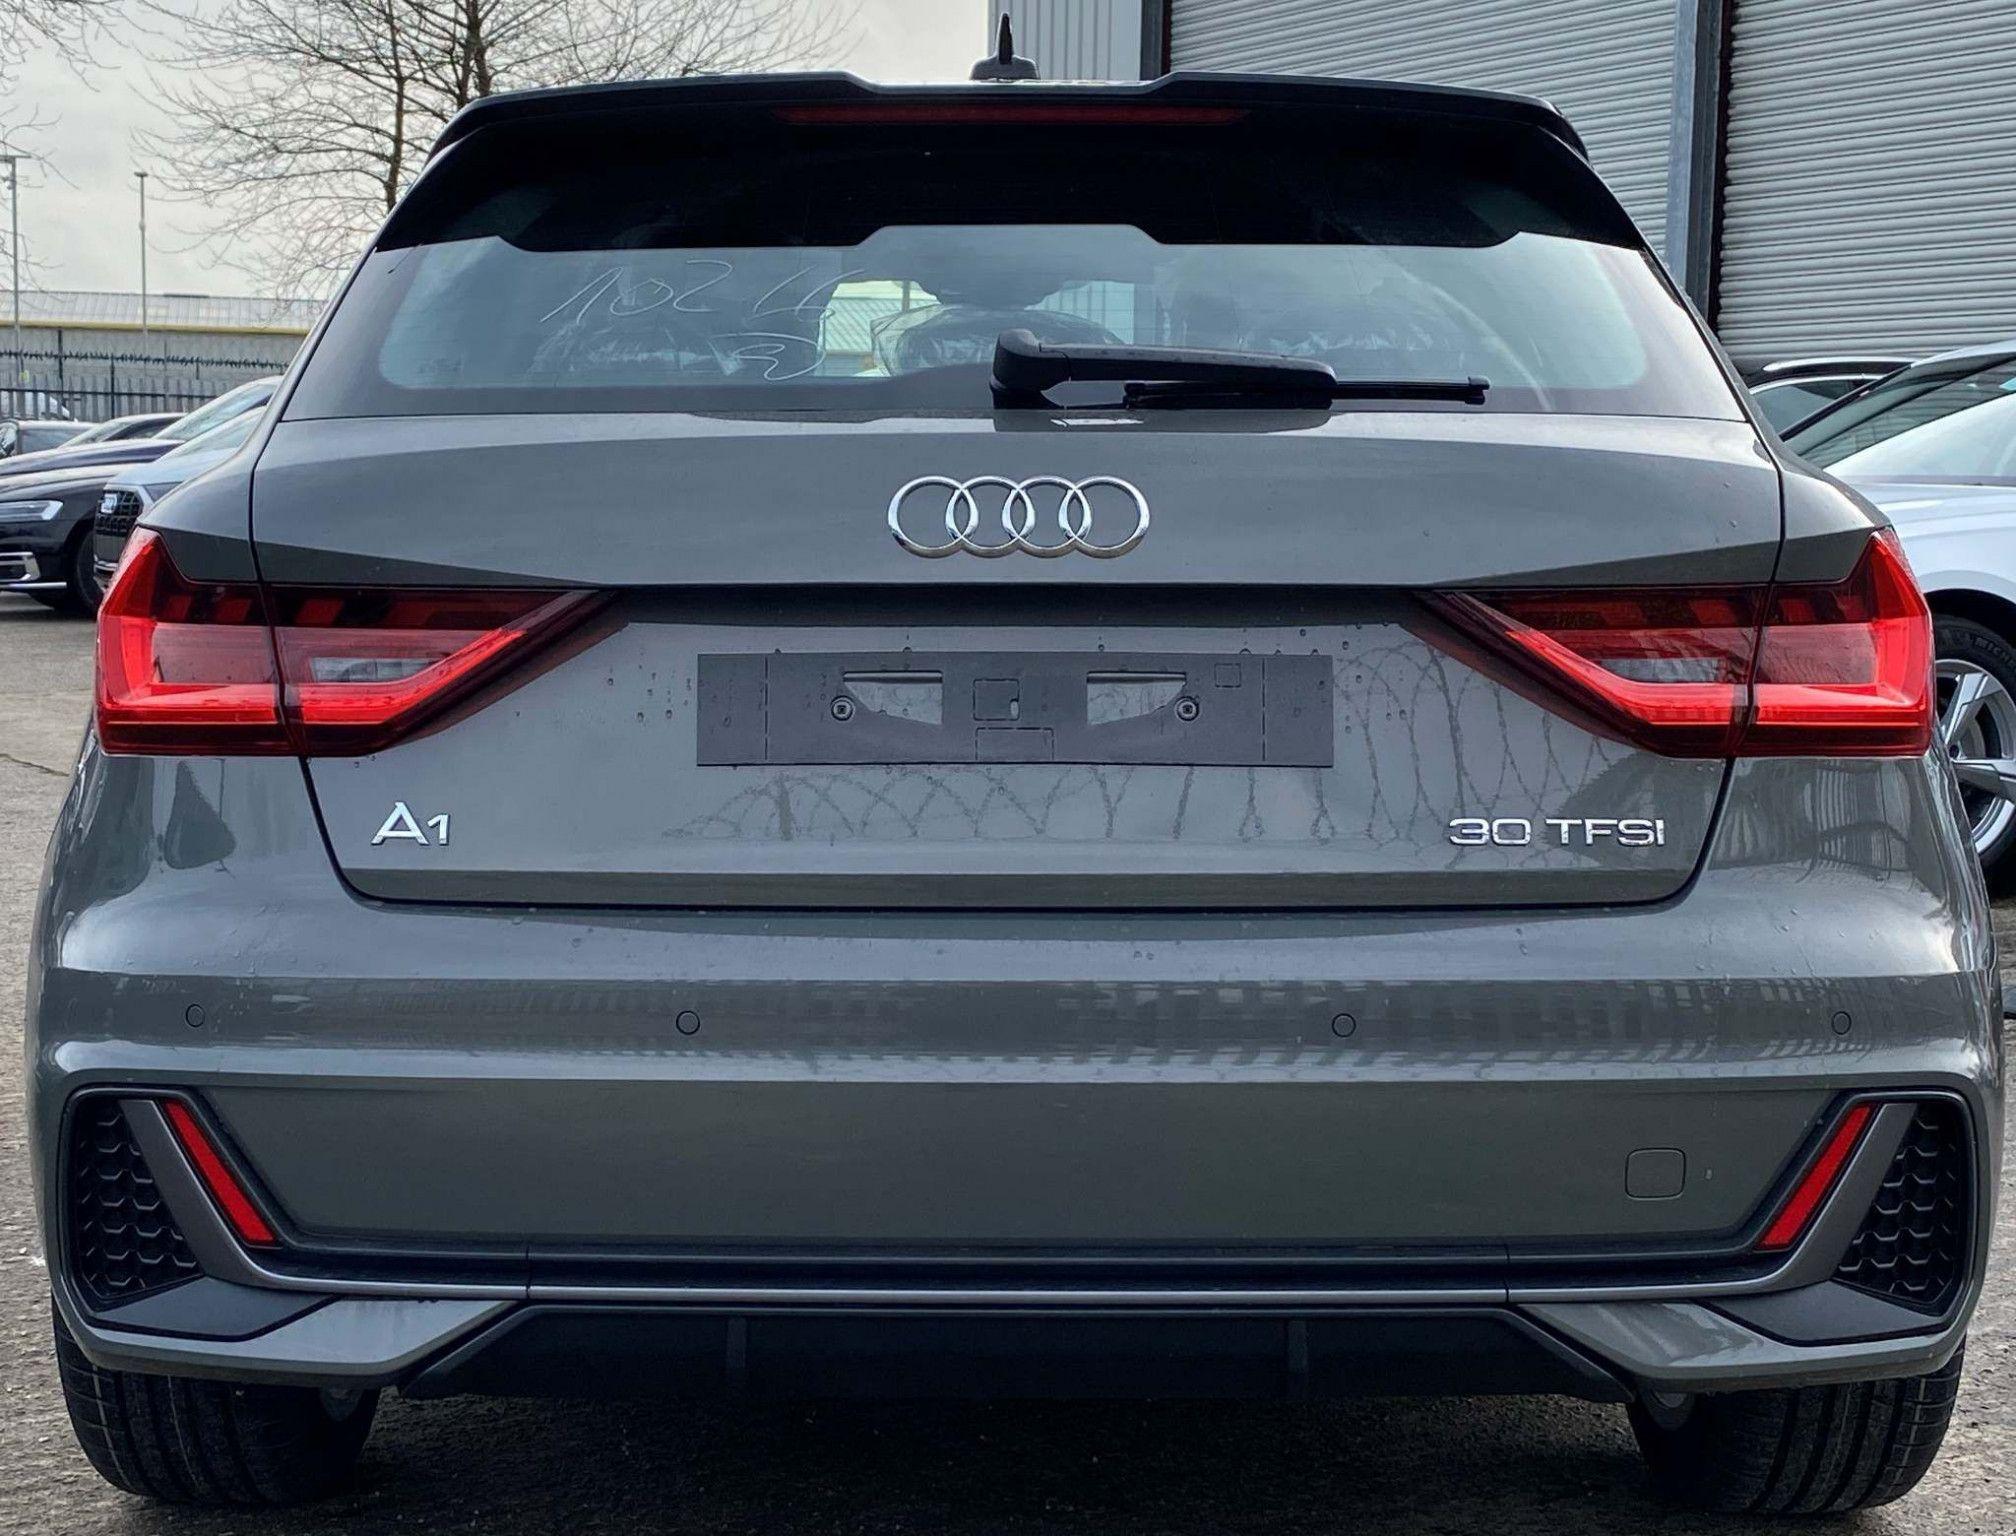 Audi A1 1 0 Tfsi 30 S Line Sportback S S 5dr In 2020 Used Audi